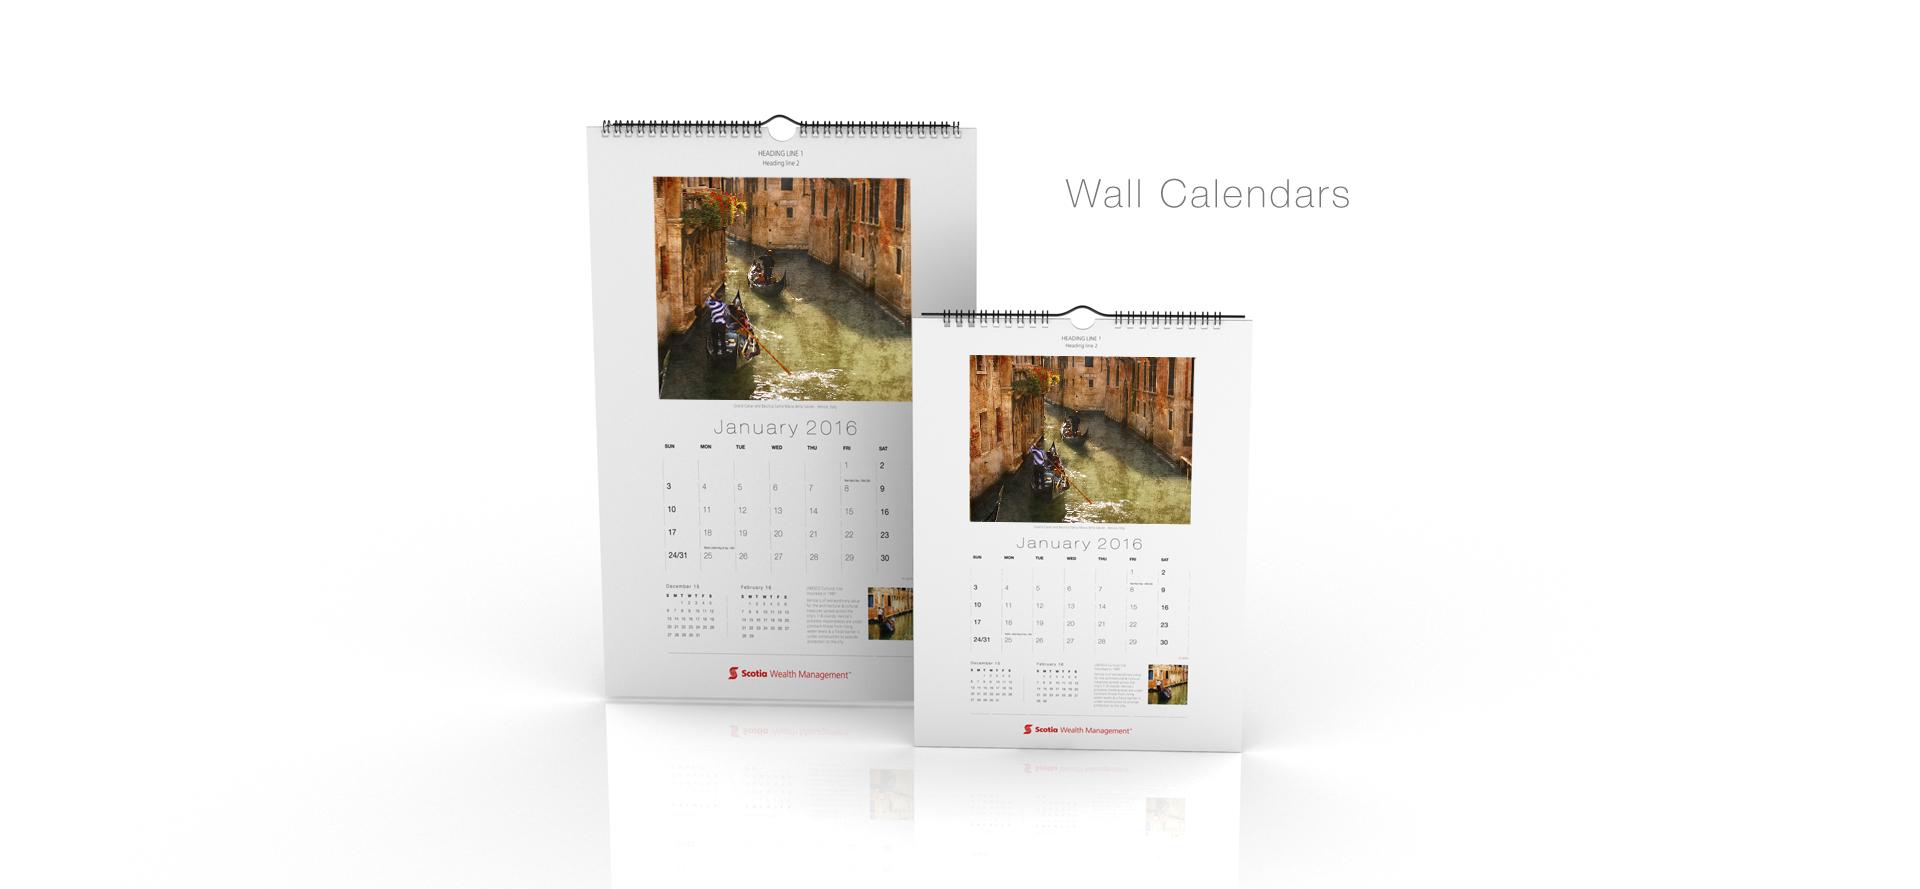 Imagine-Wall-Calendar-images-1a